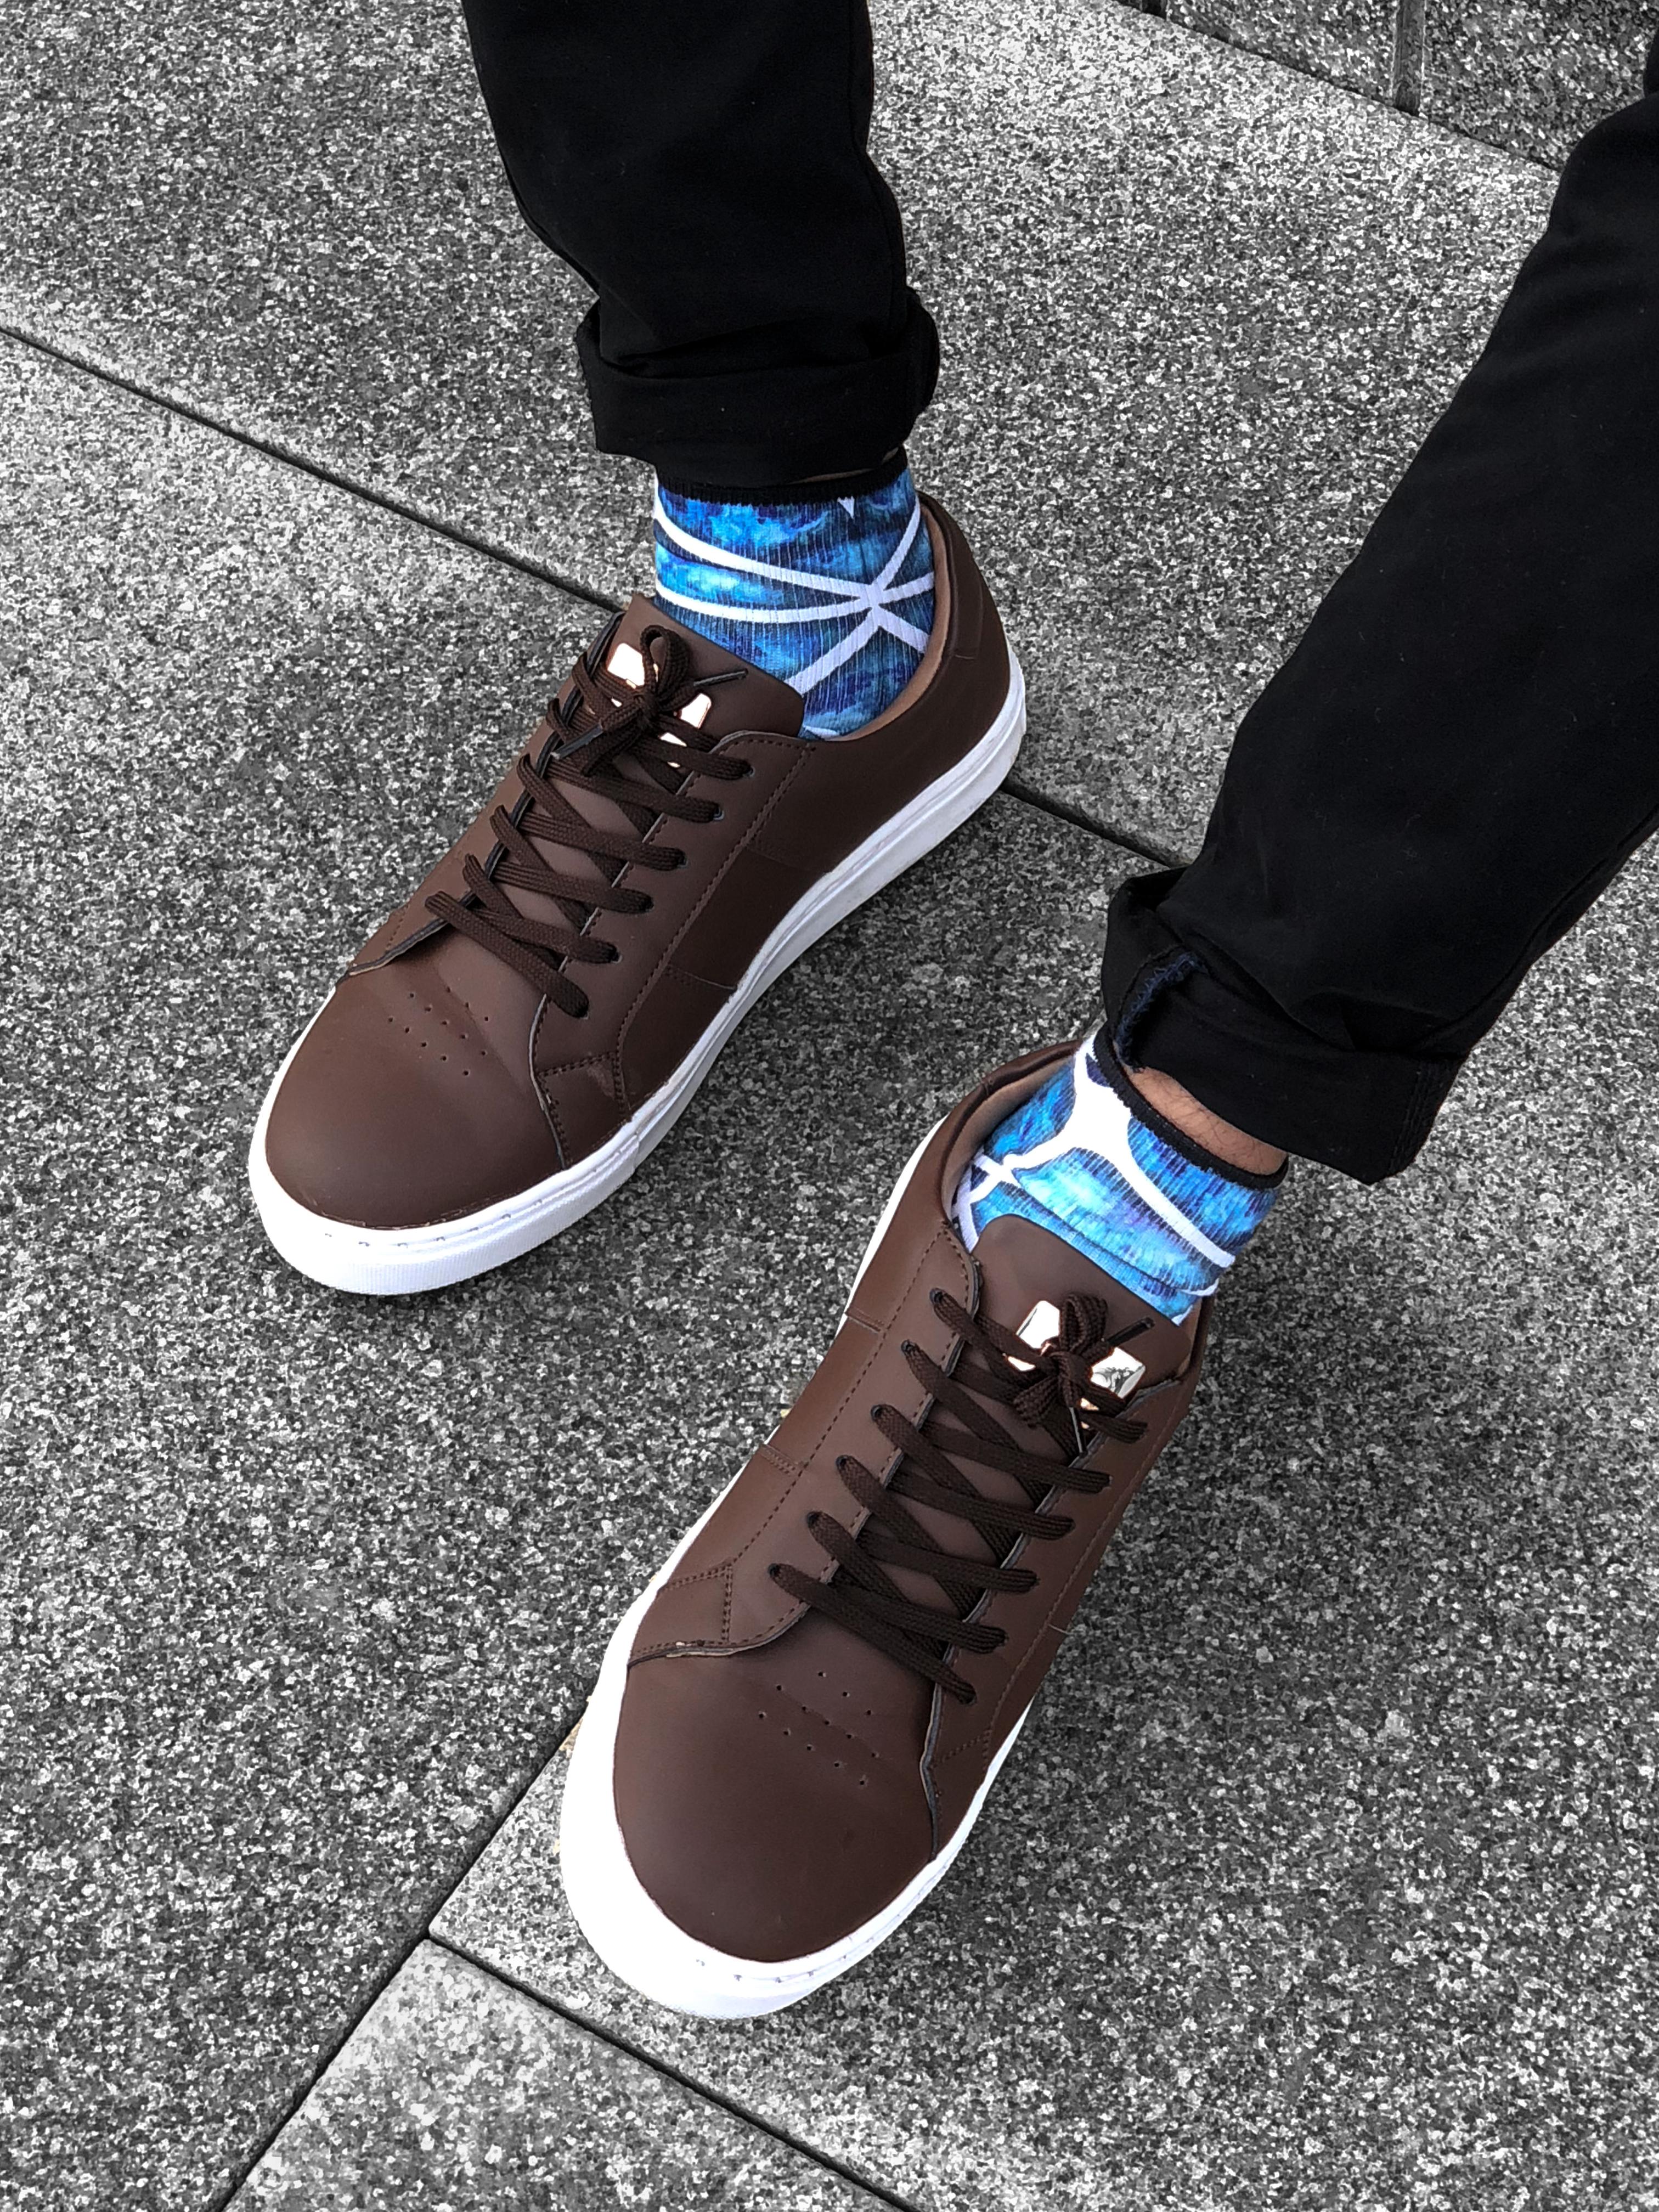 Dynamocks - Aqua Celestia Socks